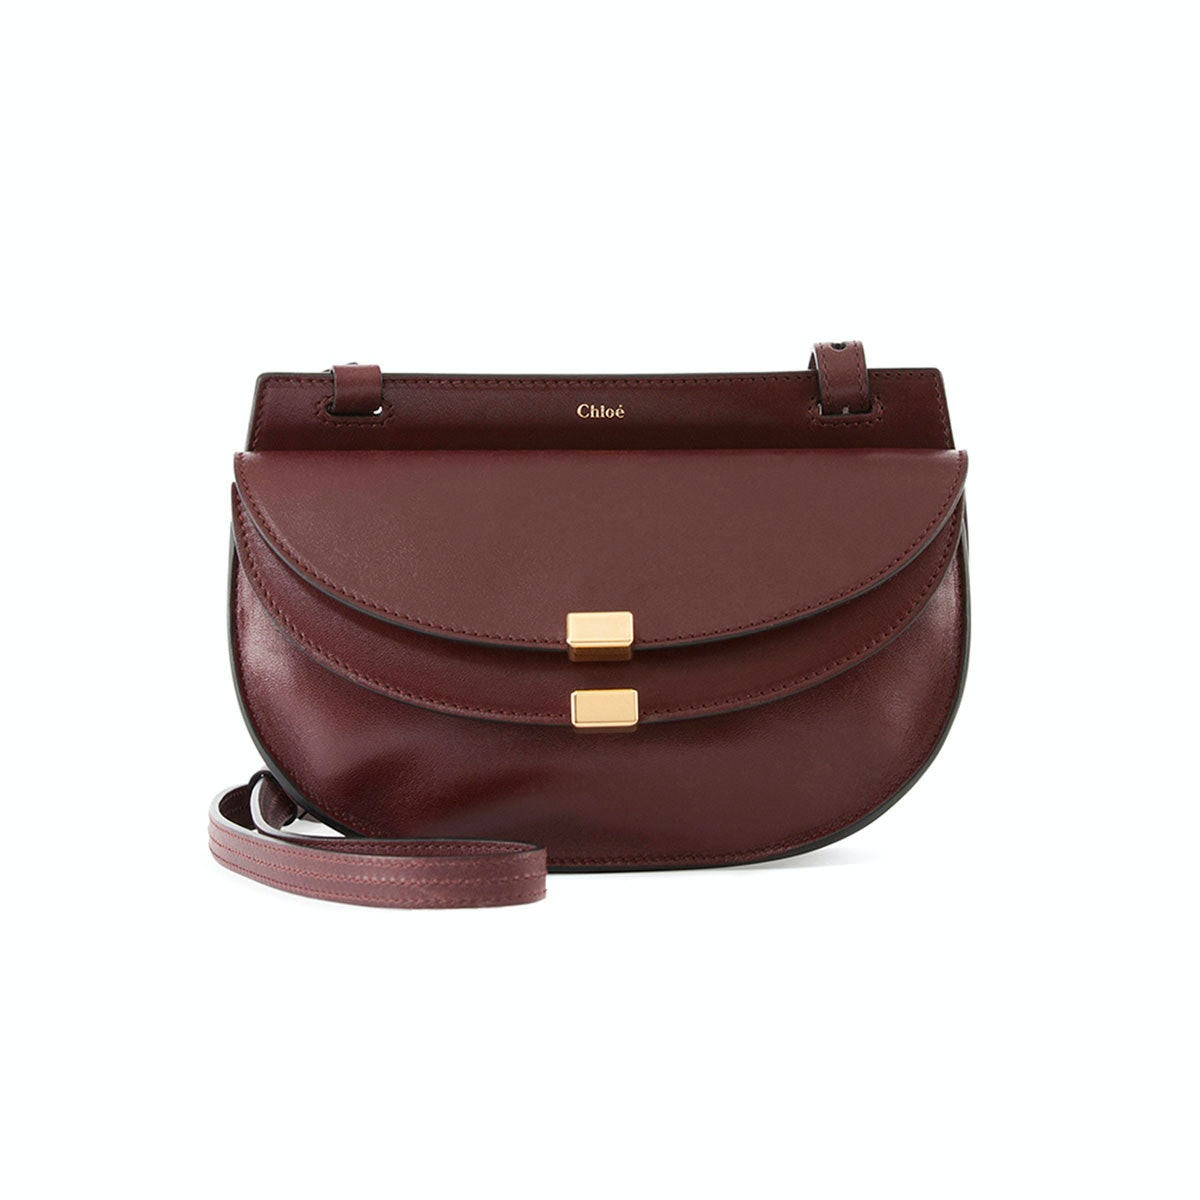 Chloe bag, $1,090, neimanmarcus.com